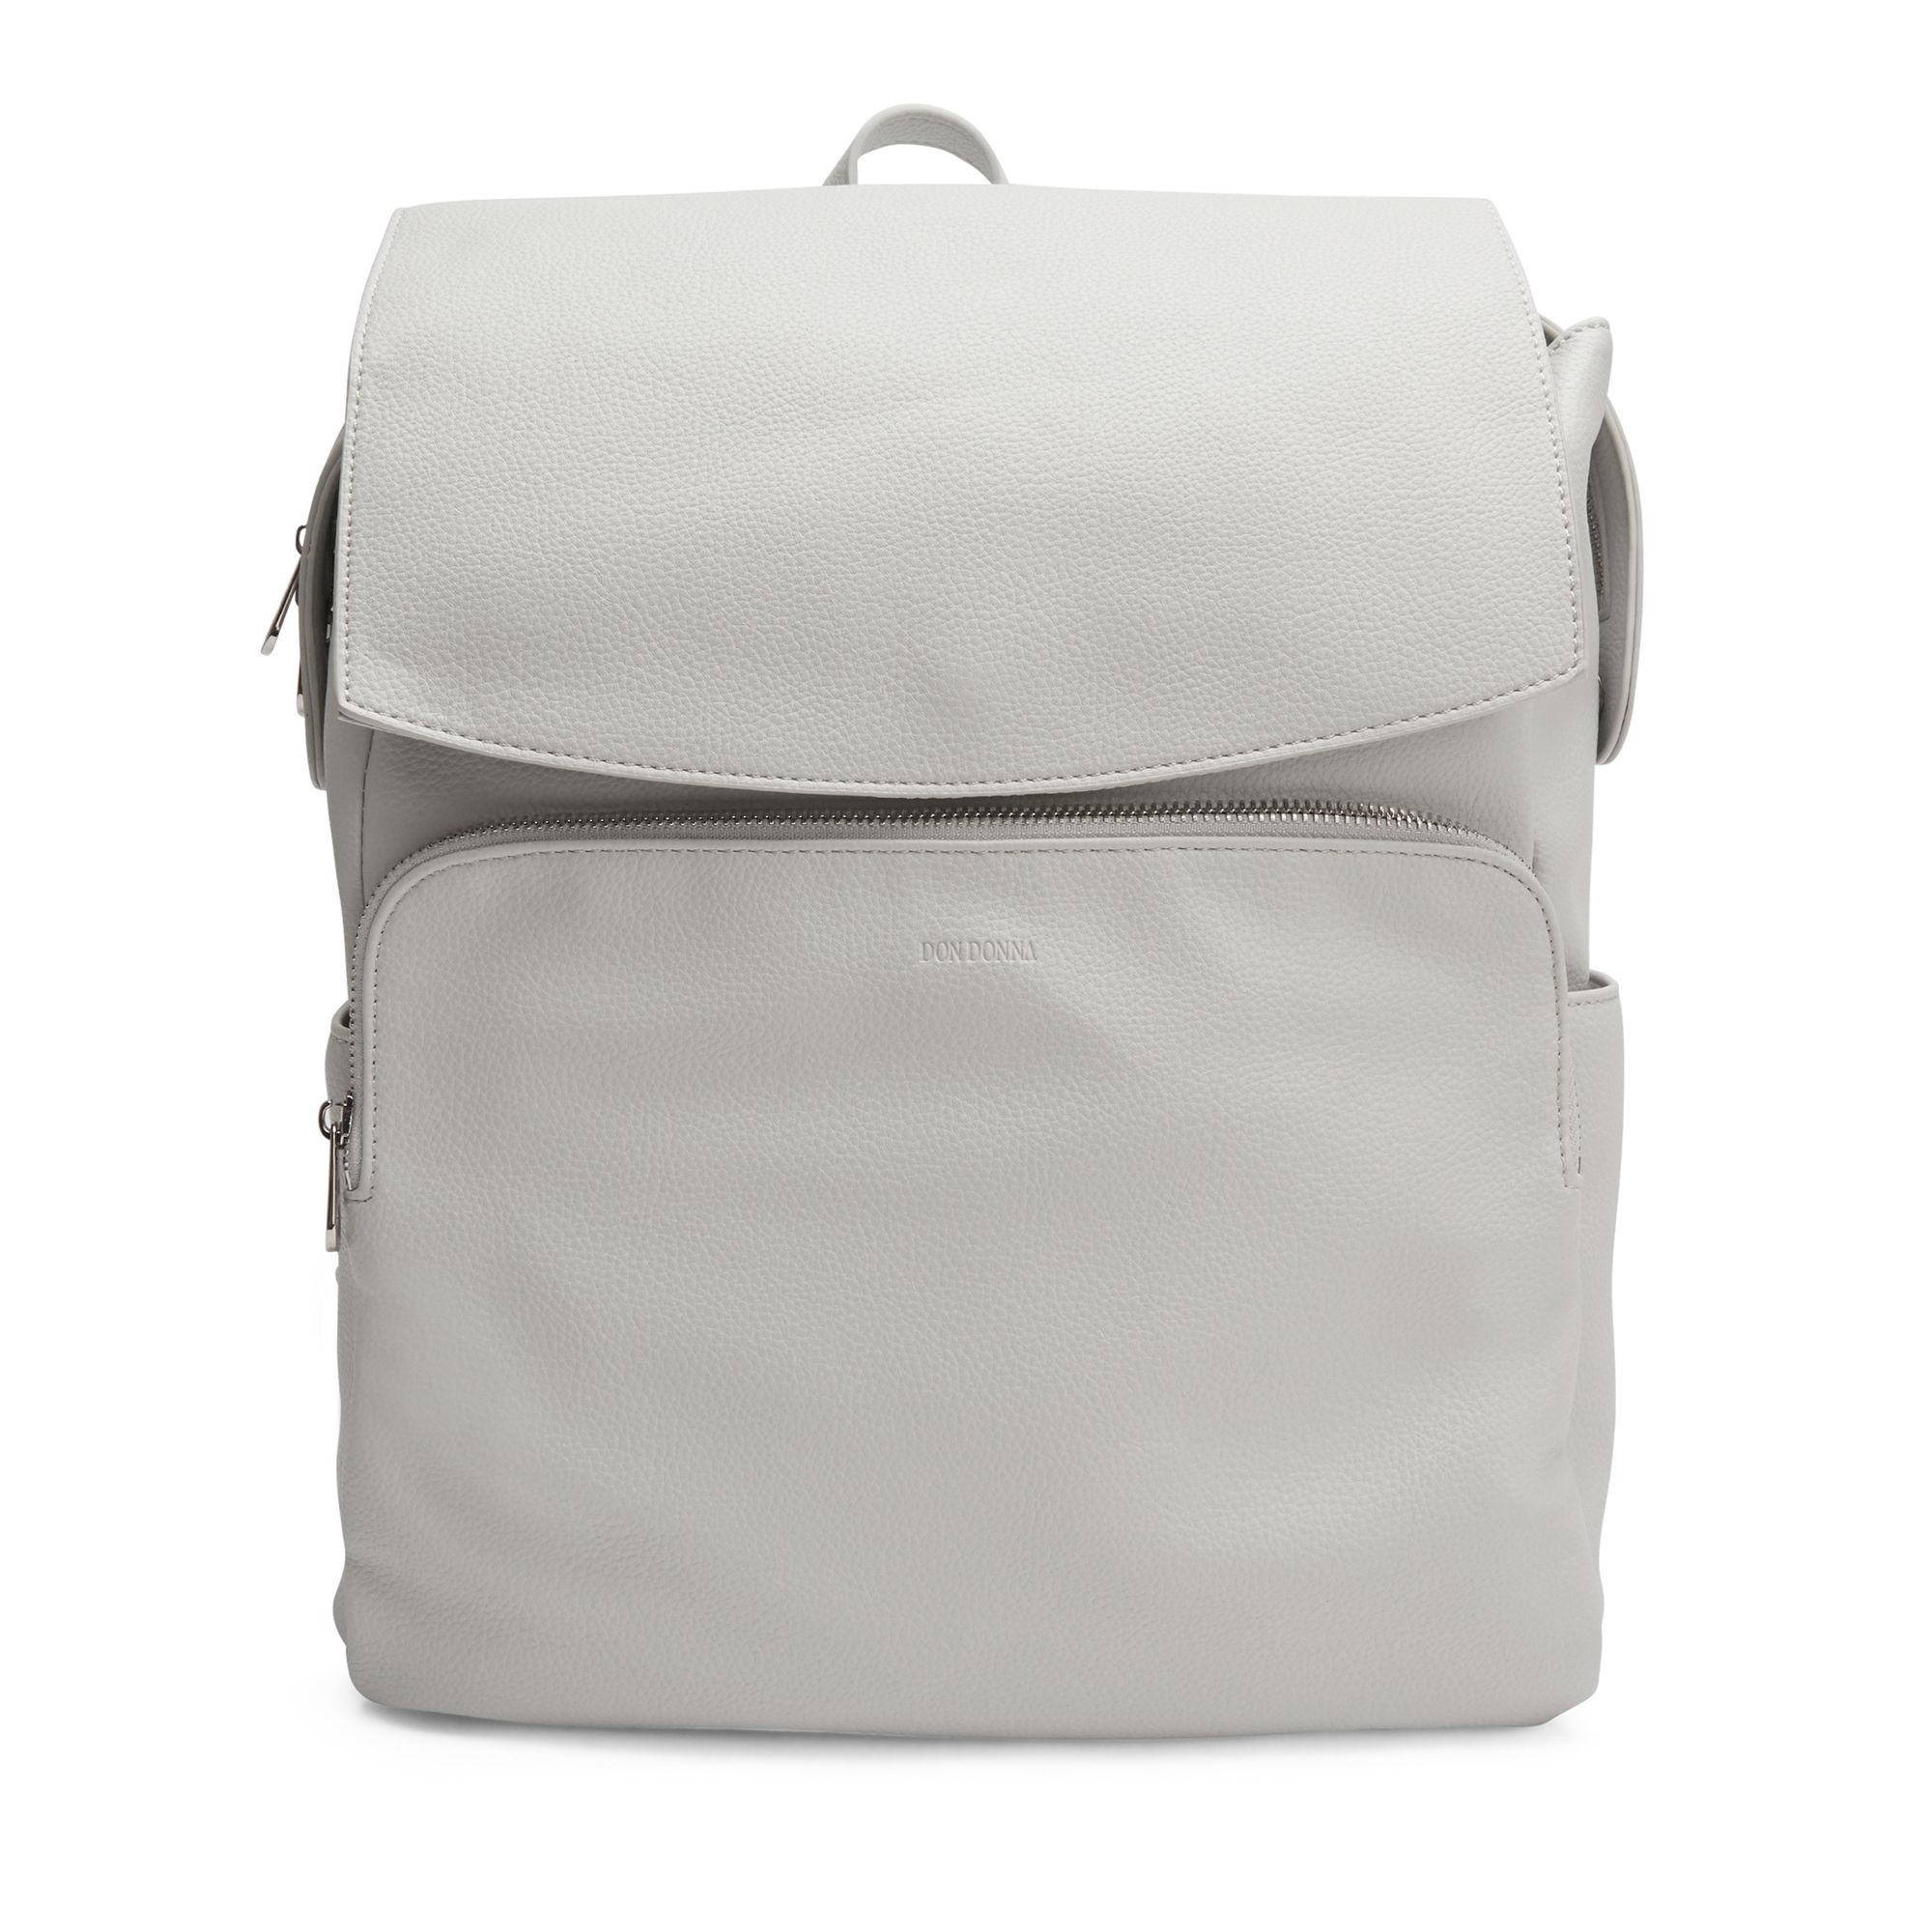 Handla online Don Donna Josefine ryggsäck med datorfack